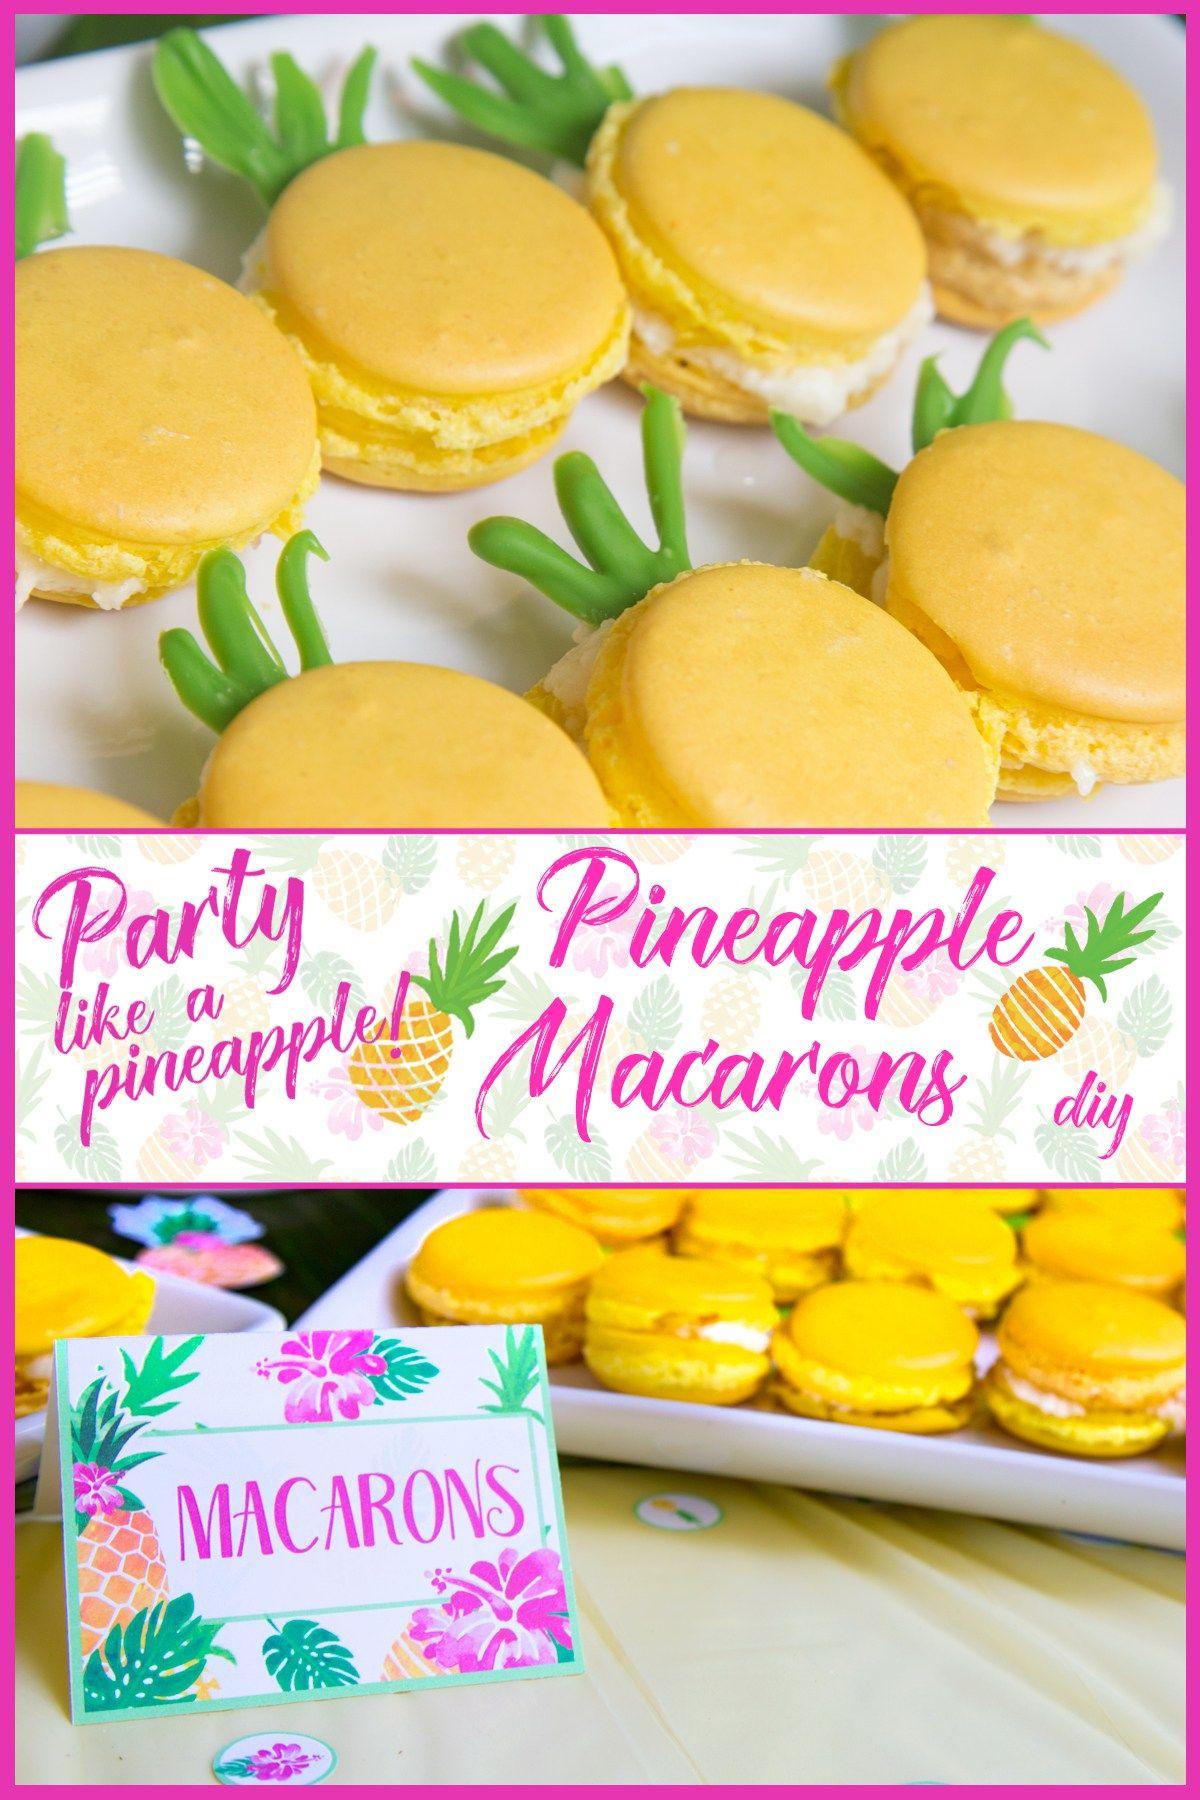 How to Make Pineapple Macarons | Aloha Hawaii | Luau food